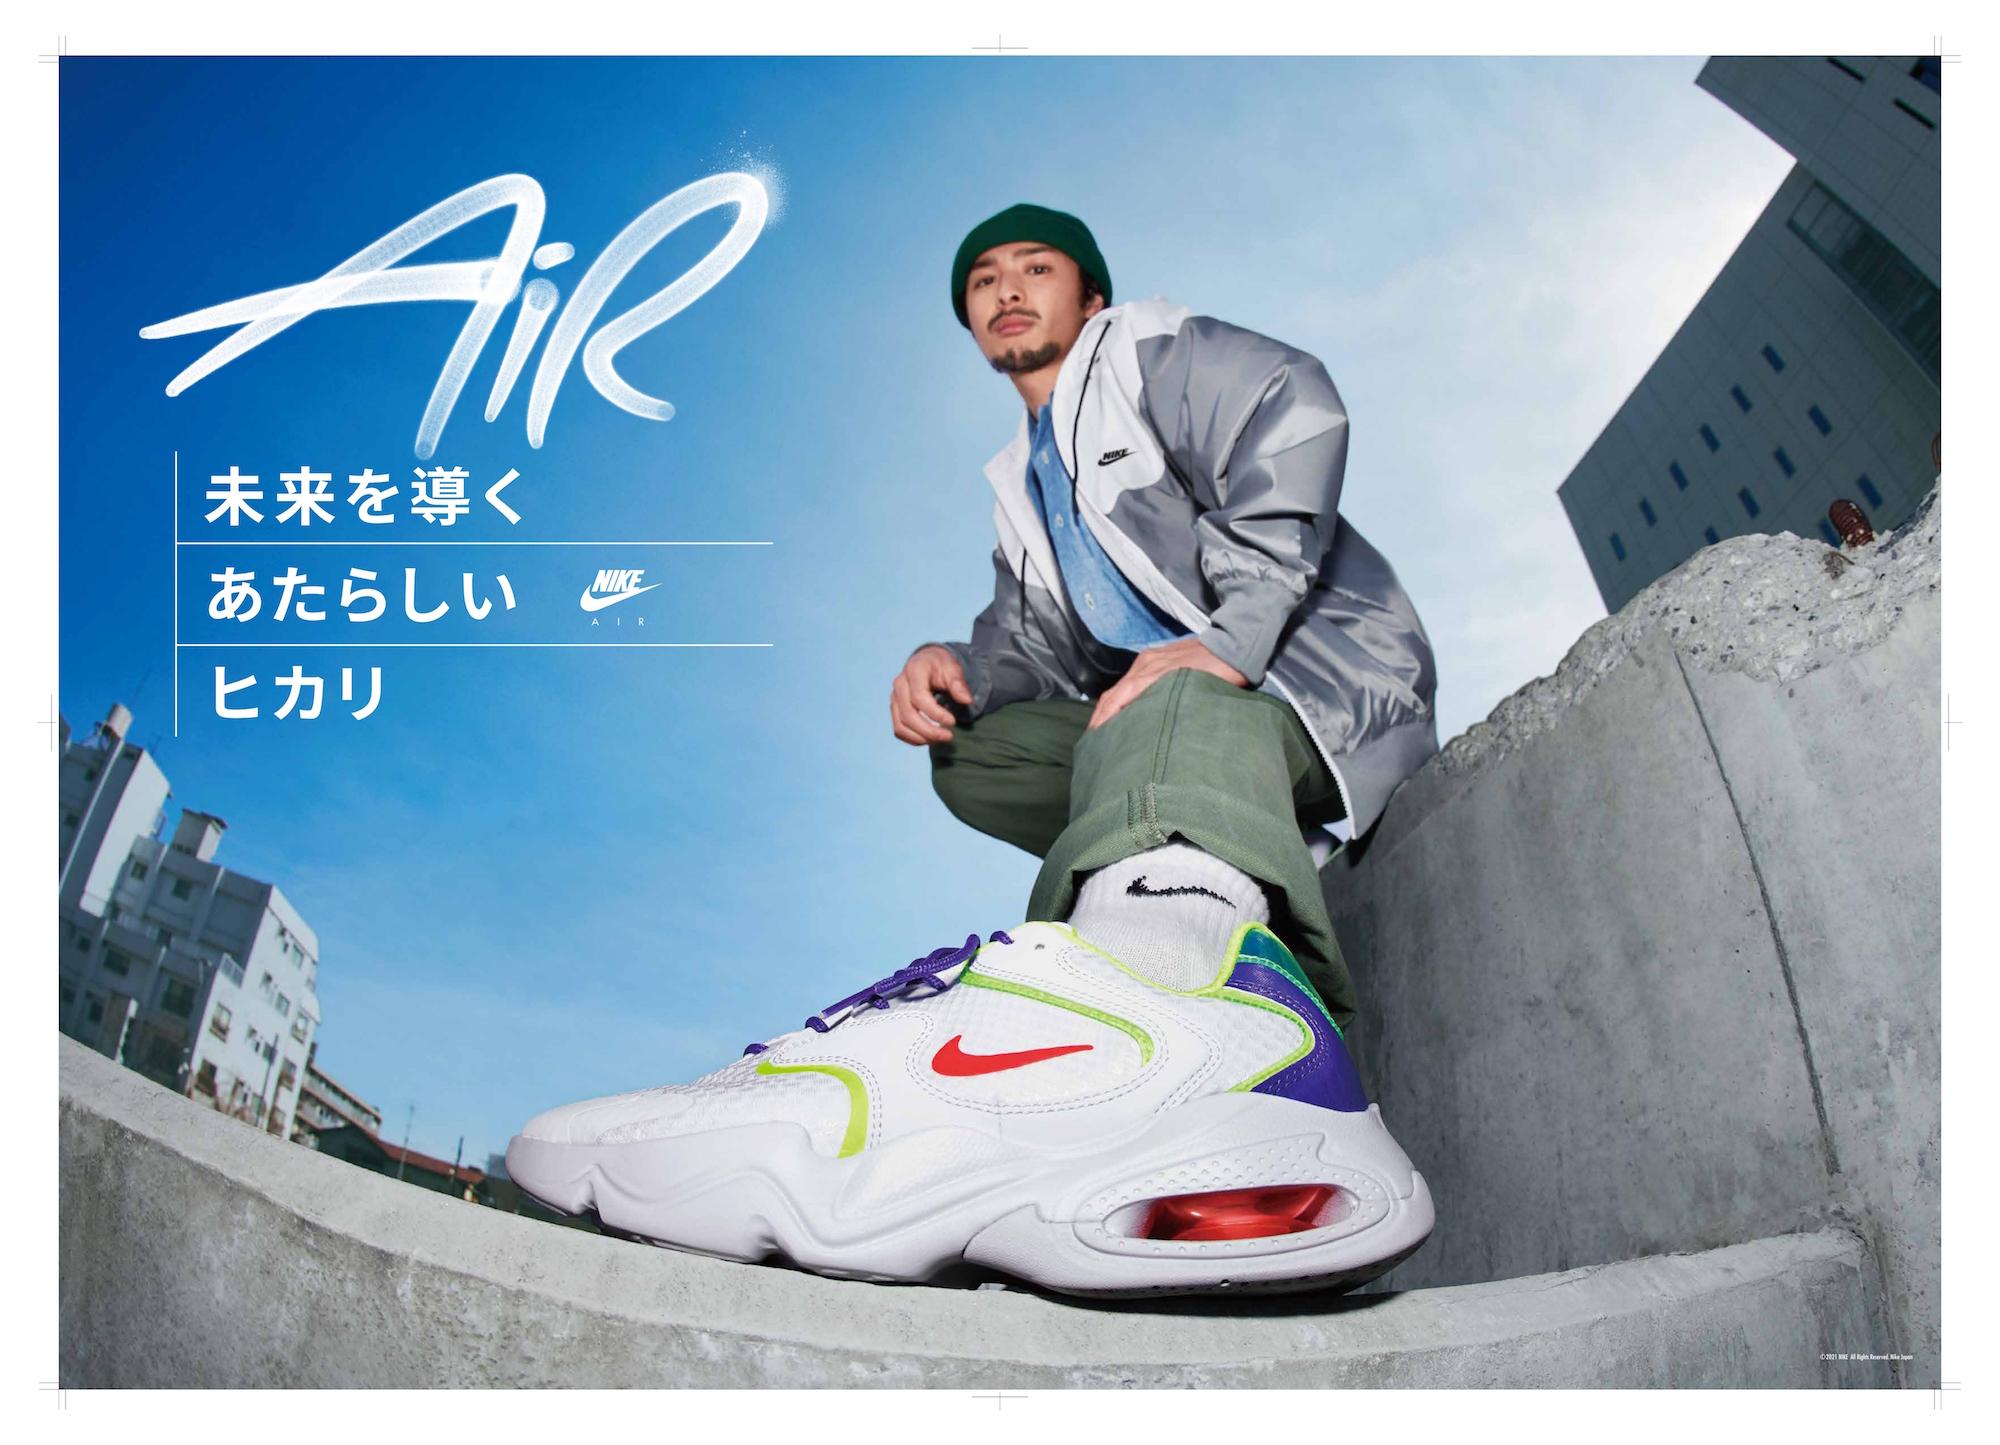 NIKE Air Max  KEN YOSHIMURA HAIR